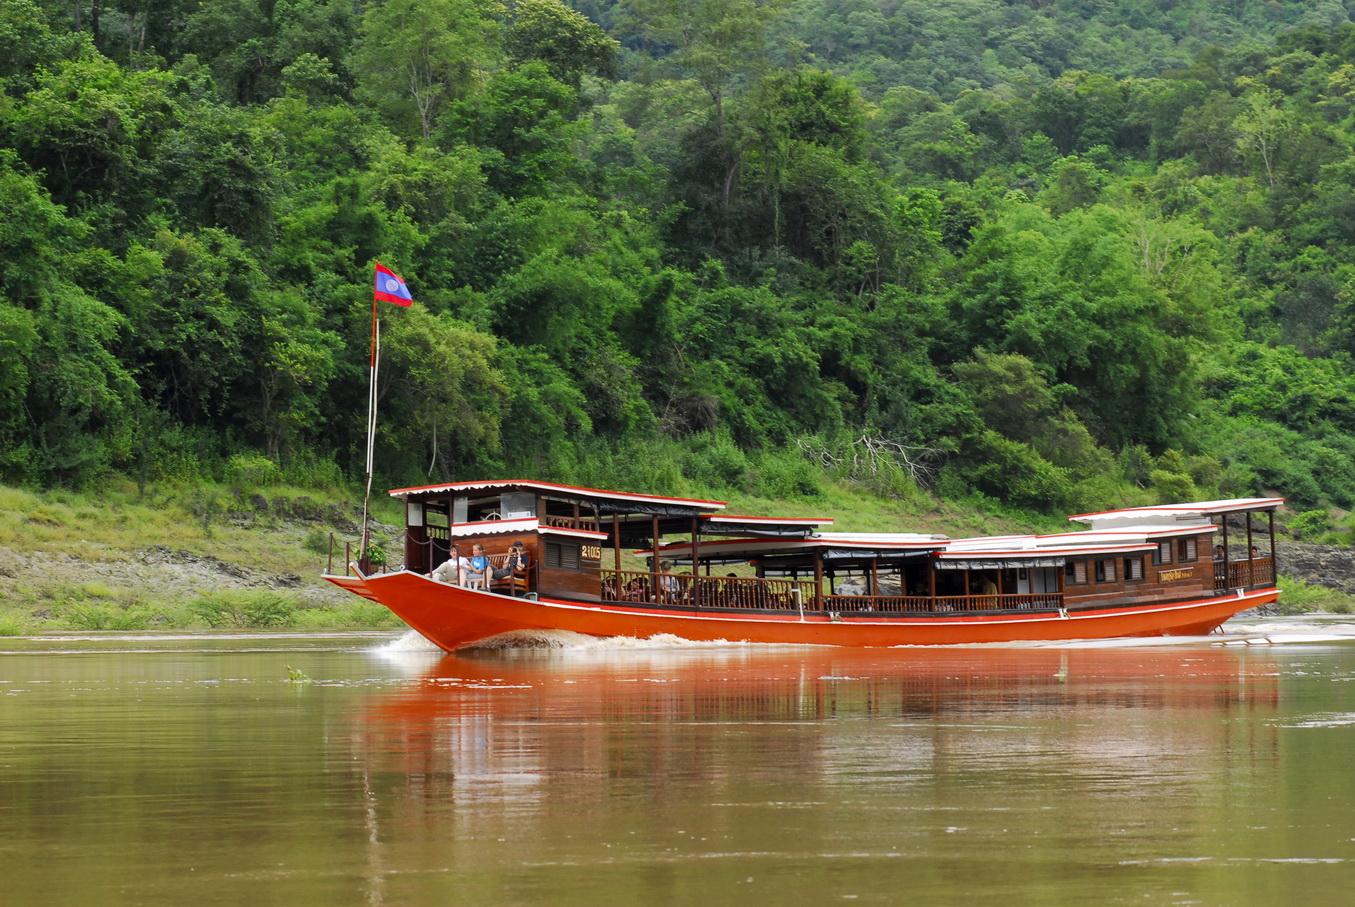 Cruising in Mekong River - Laos Part